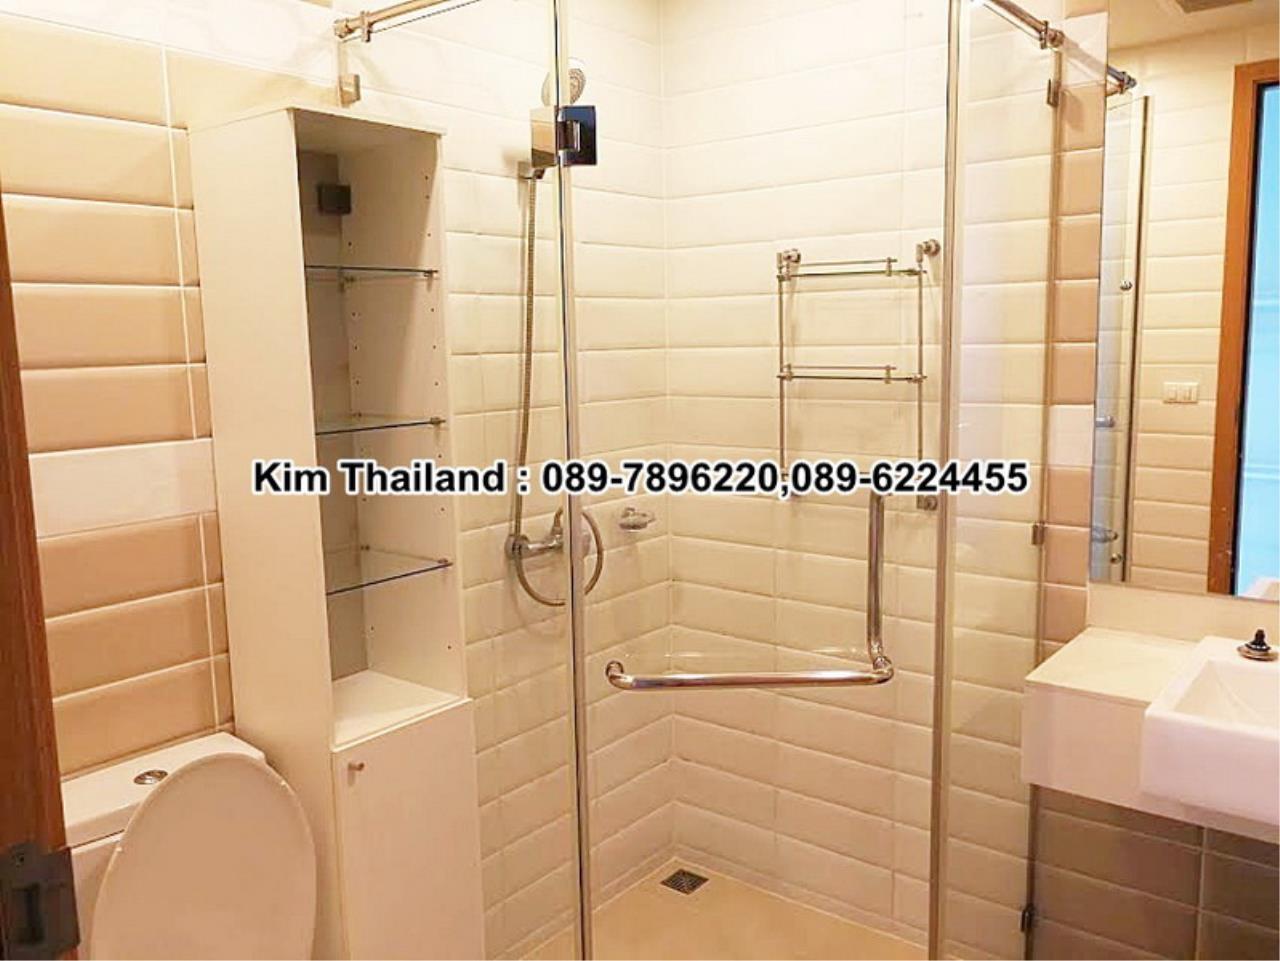 BKKcondorental Agency's For rent, Circle Condominium.  Area 76 sq.m. 2 bedrooms. Rental 35000THB/month. 6